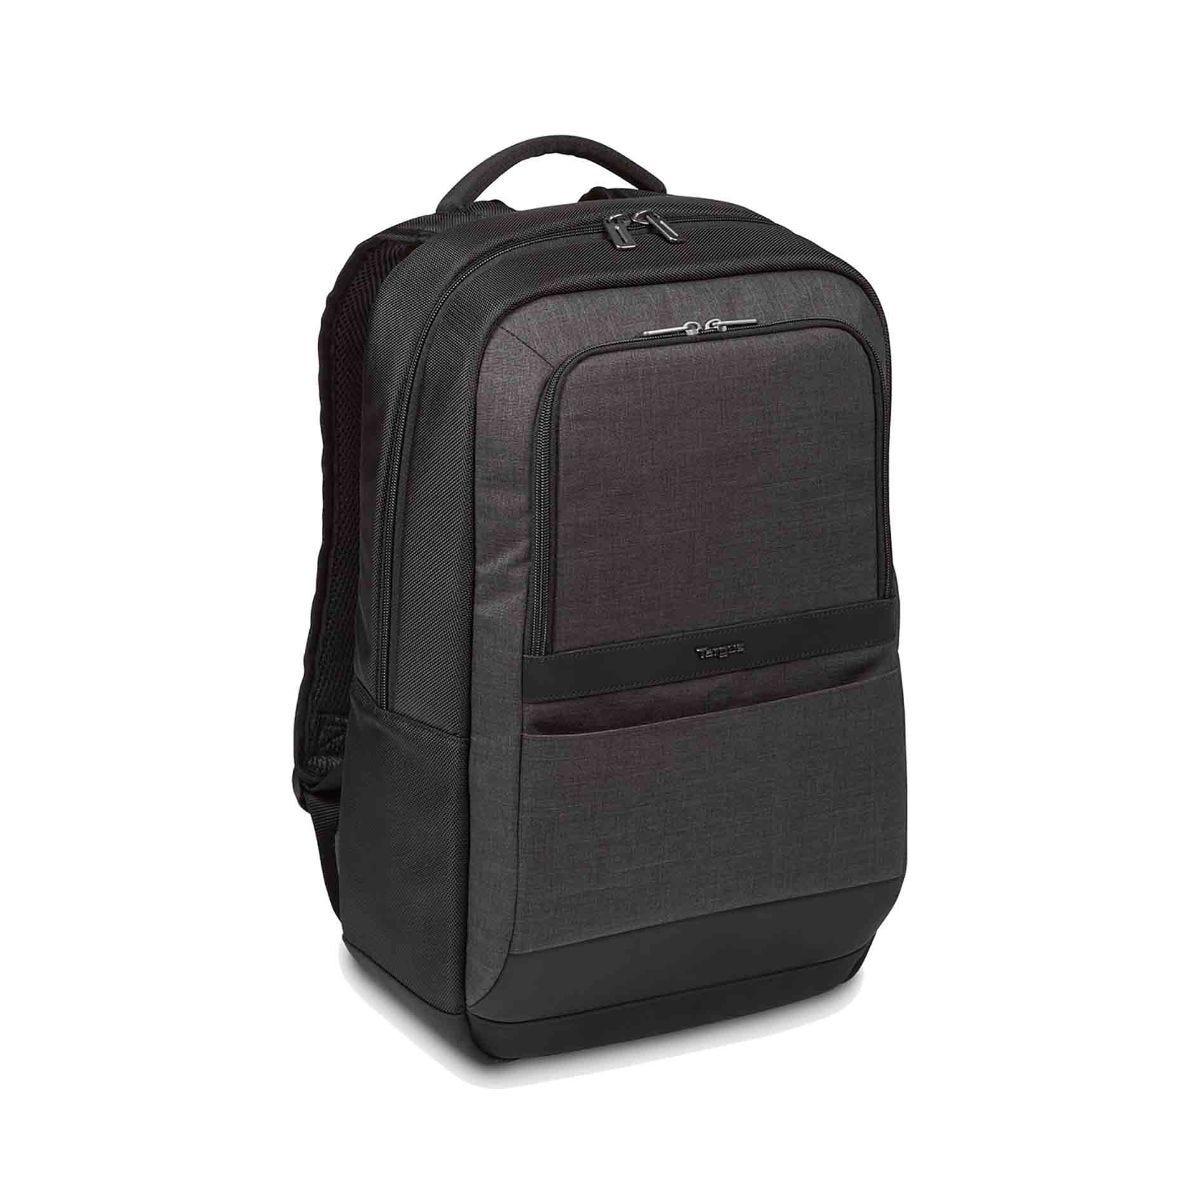 Image of Targus CitySmart Essential Laptop Backpack 15.6 Inch, Black/Grey